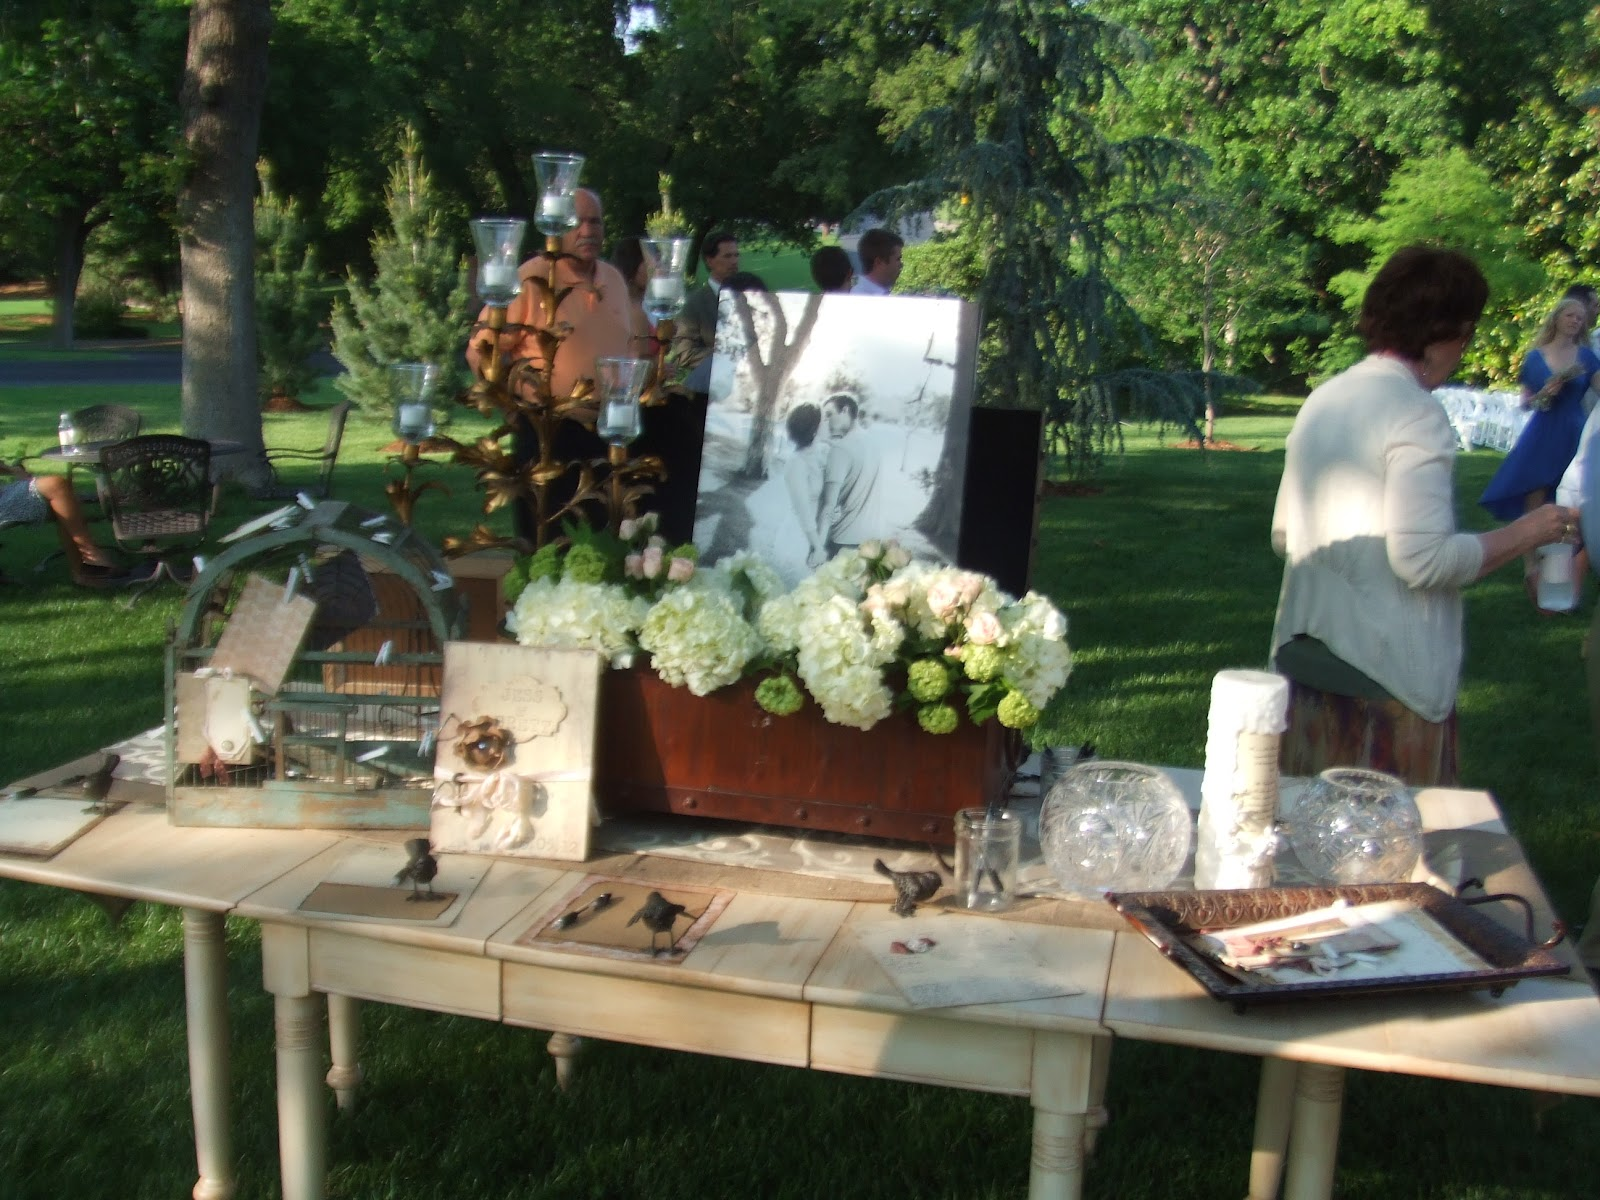 wawawaughs one of the most beautiful backyard weddings